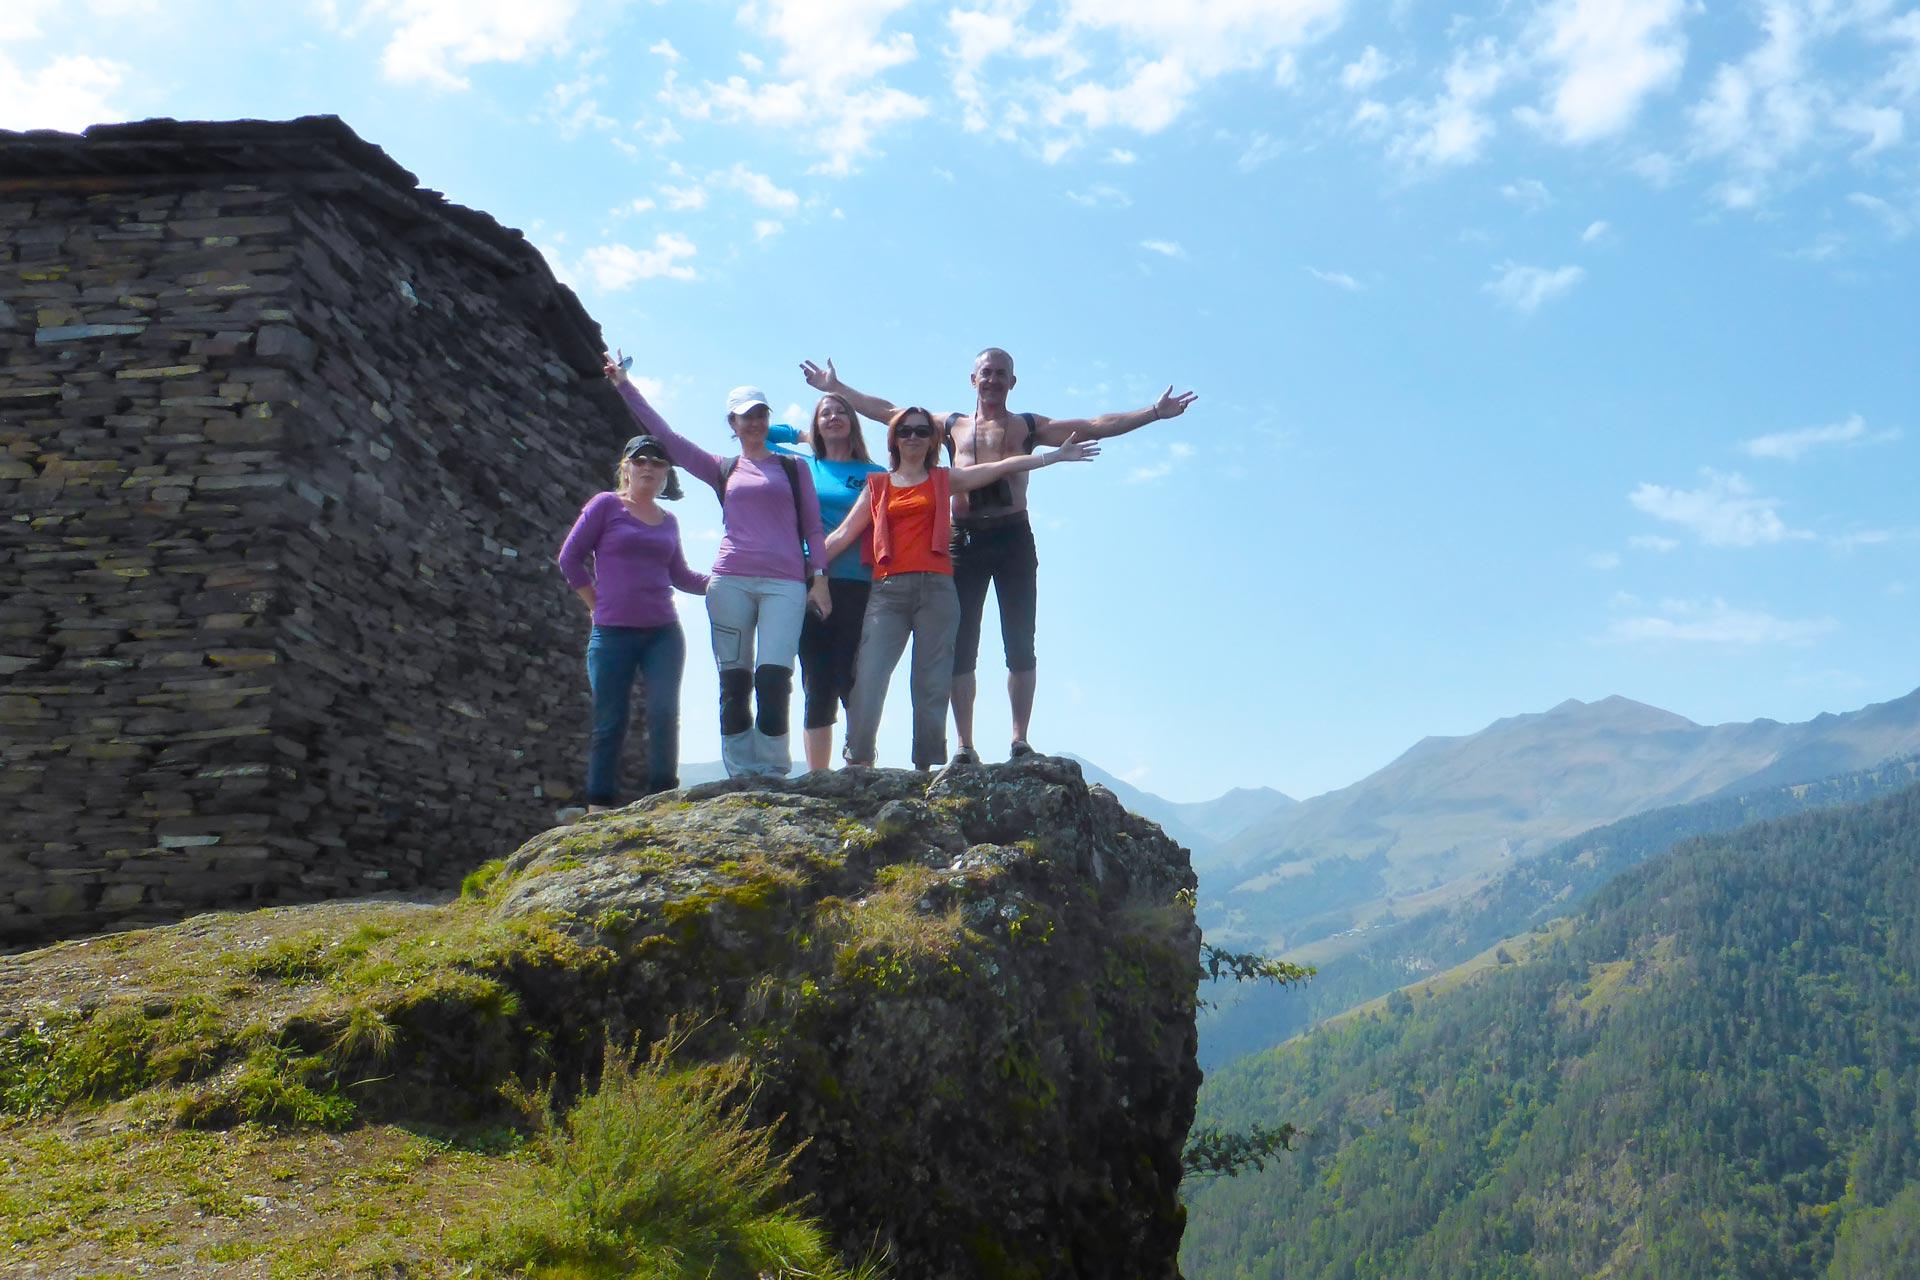 Грузия — по горам на полном приводе: легенды Хевсурети и Тушети